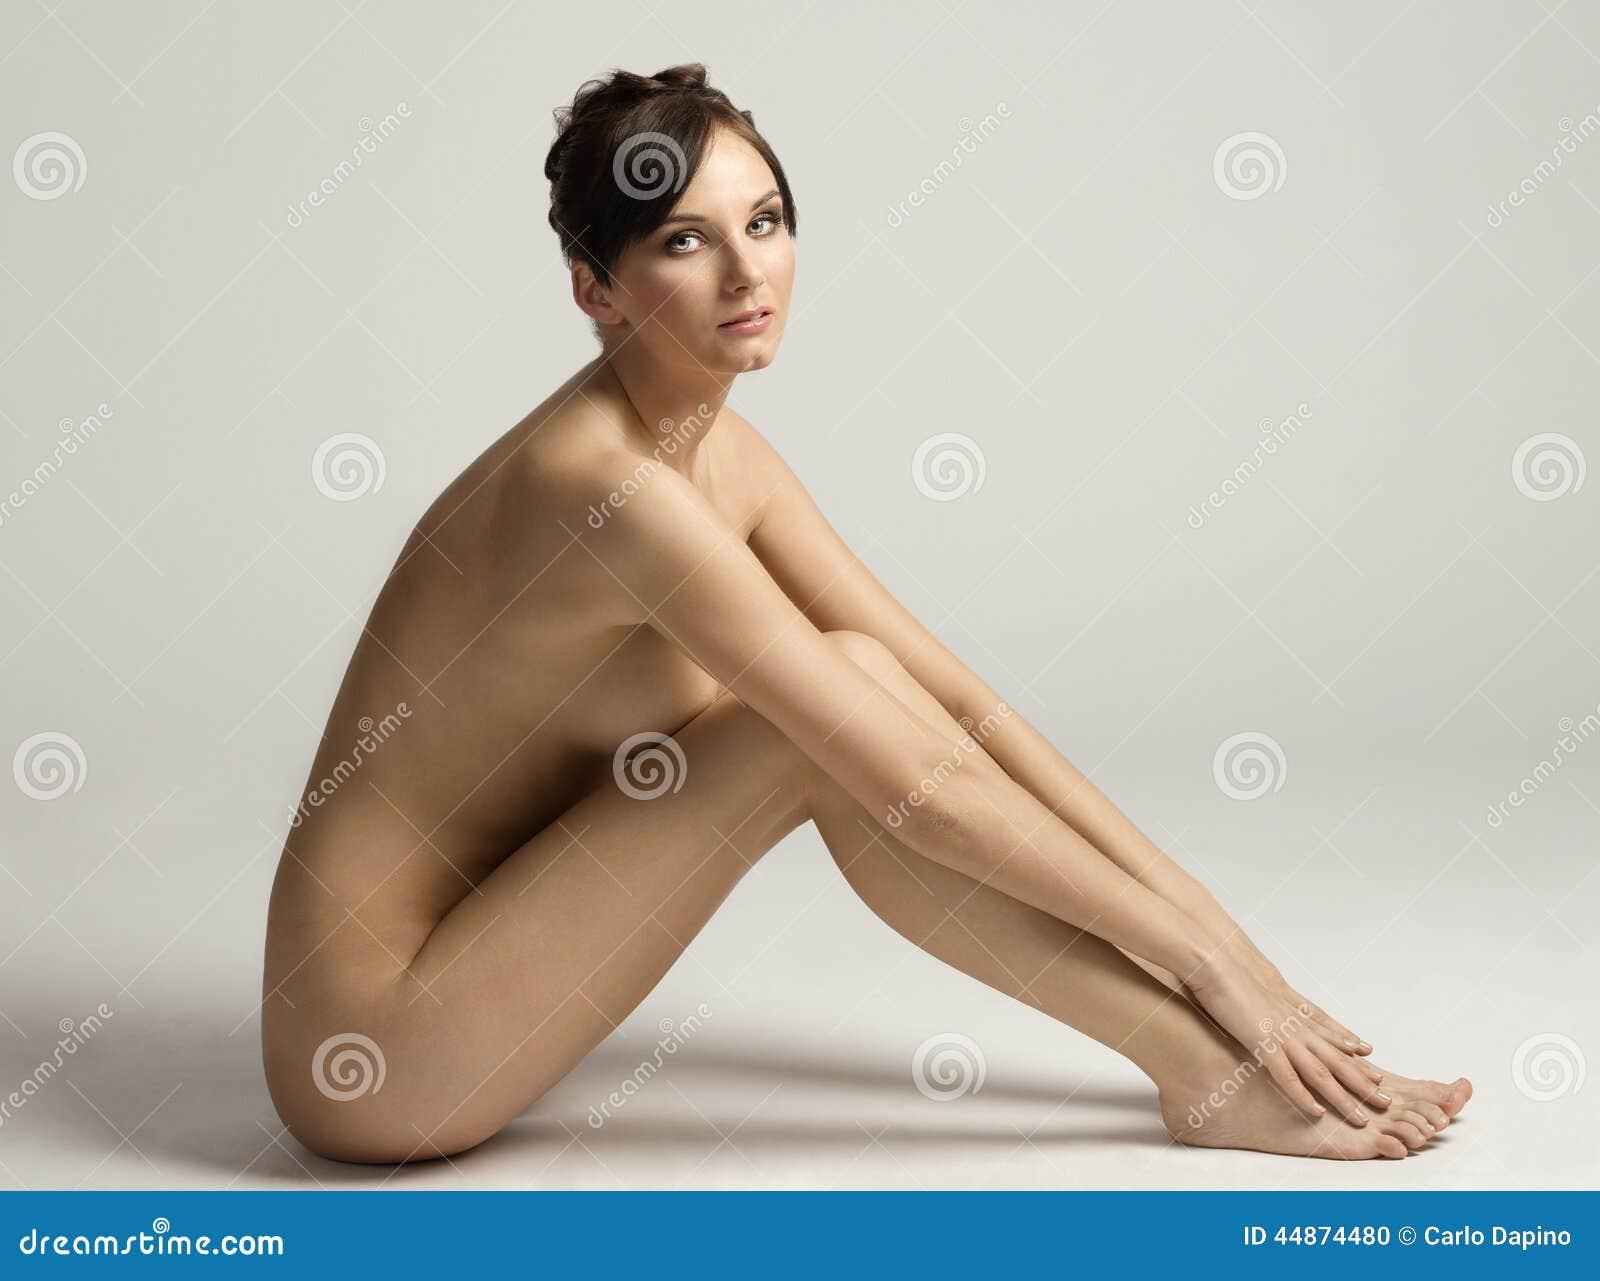 natural-beauty-pics-nude